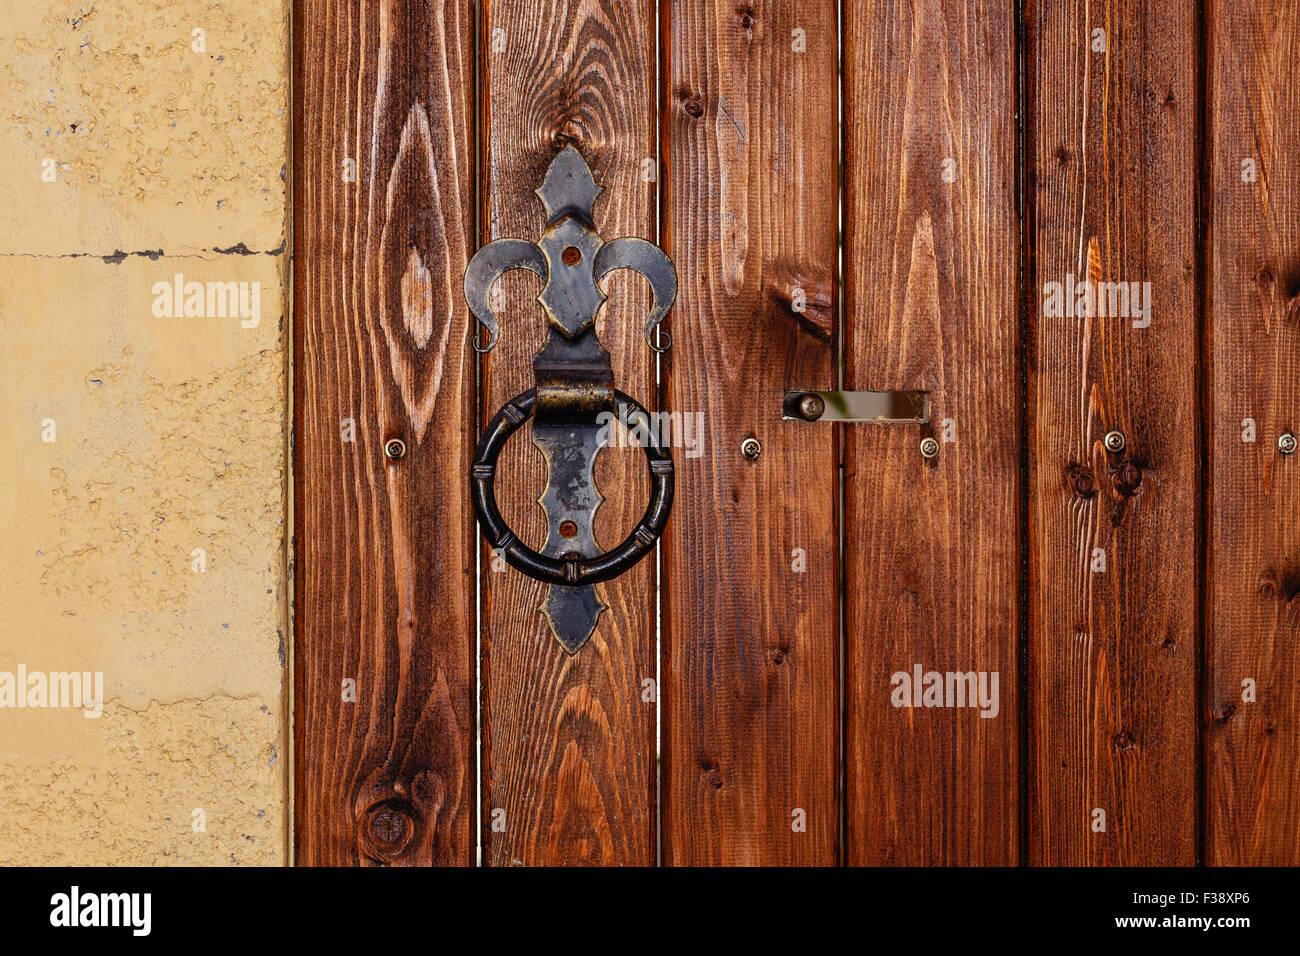 Round Metal Door Handle On A Wooden Door With Bolt. Safety Concept.